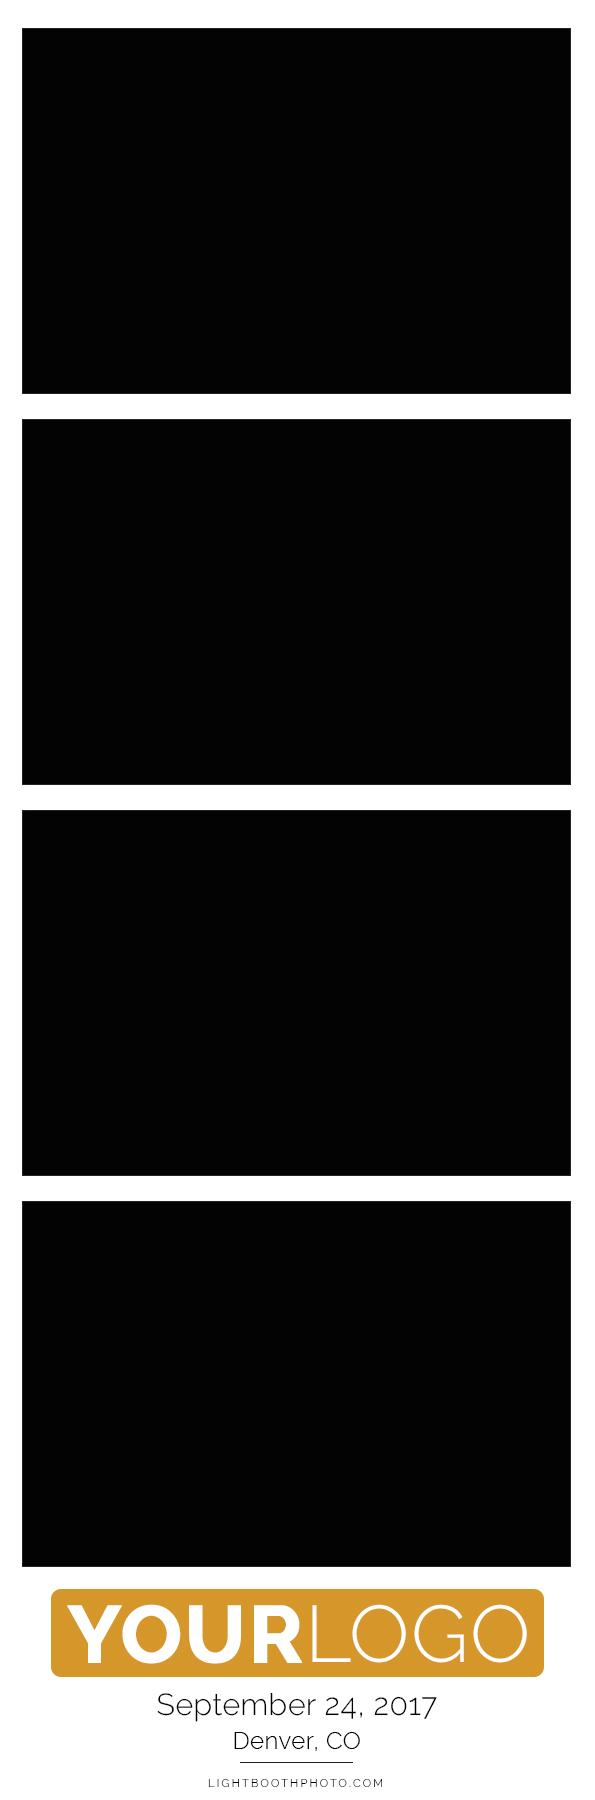 Logo print 4.jpg